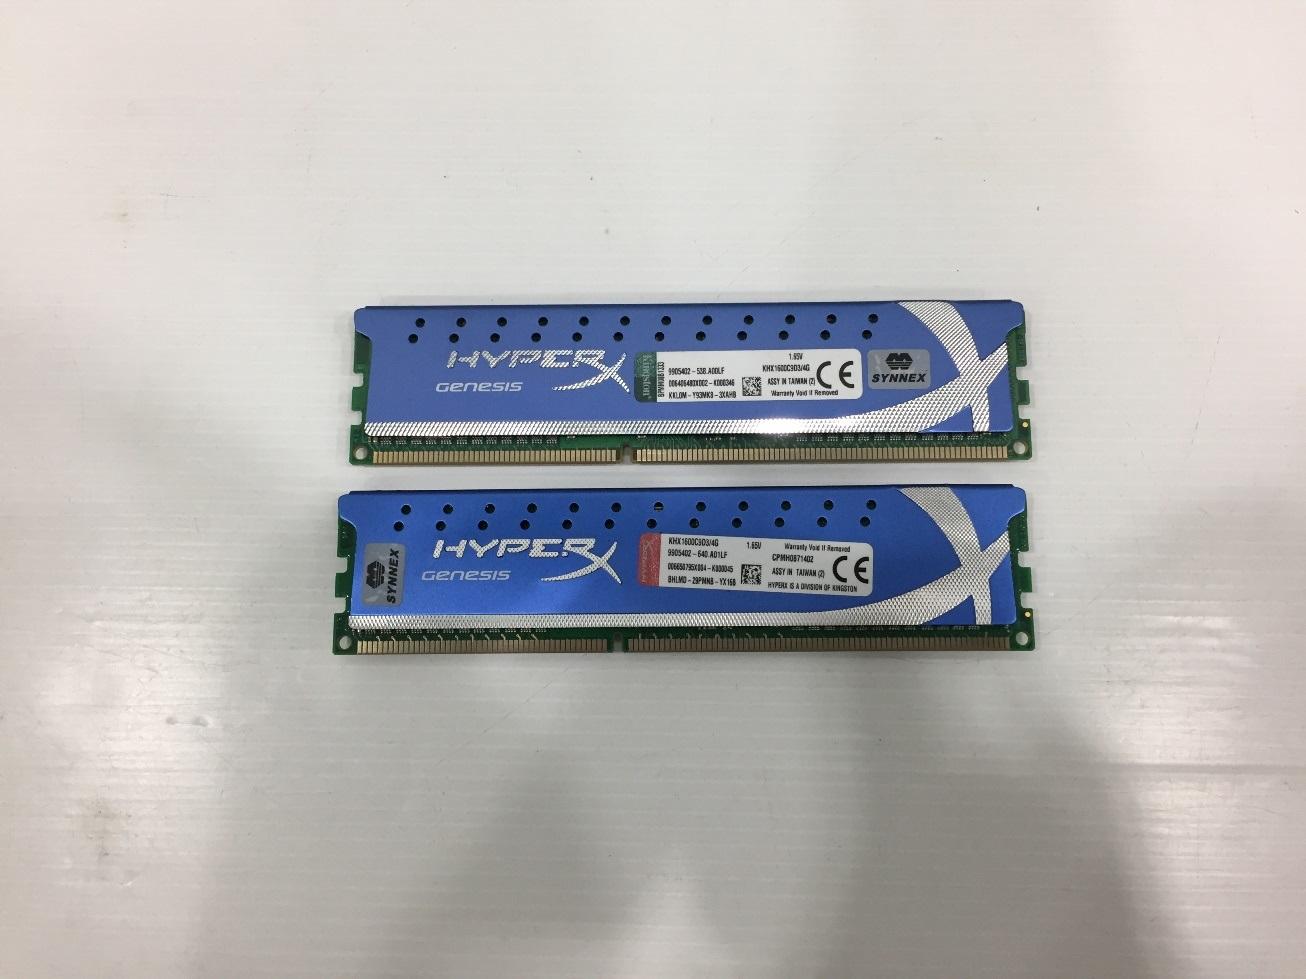 RAM 4GB. DDR-3 KINGSTON Genesis